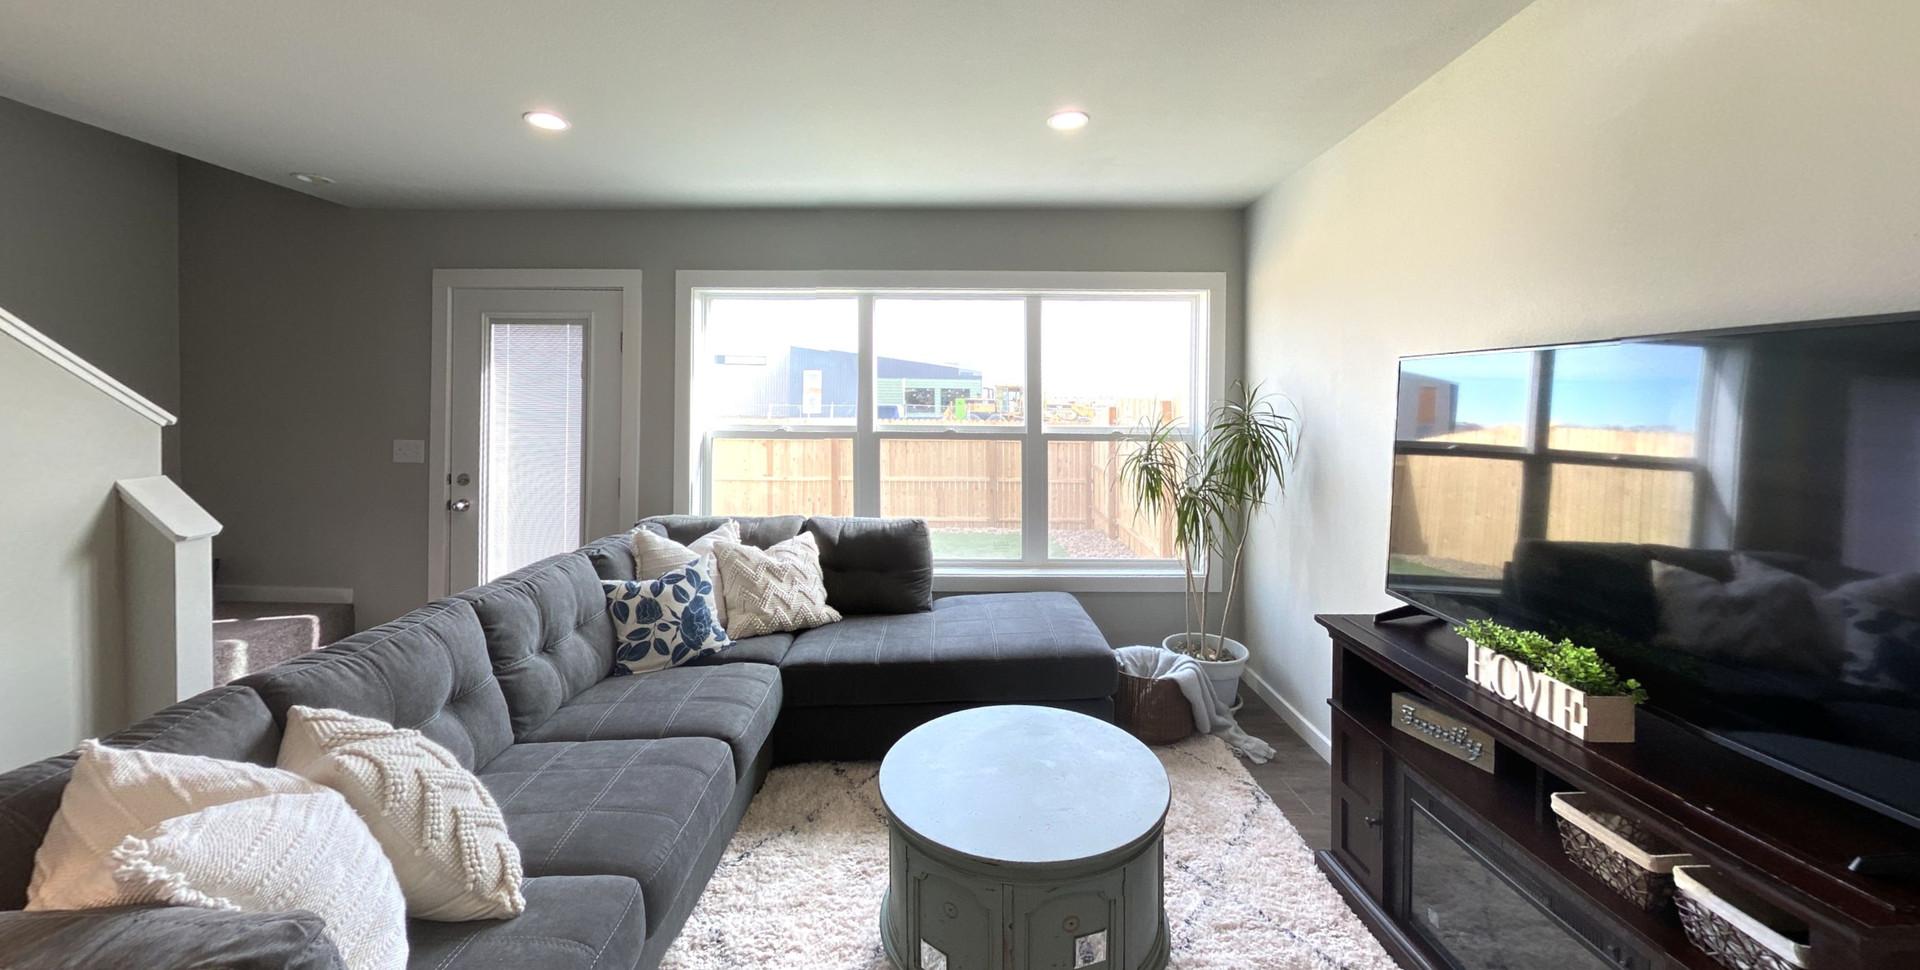 310-Omnia-Living-Room(2).jpg